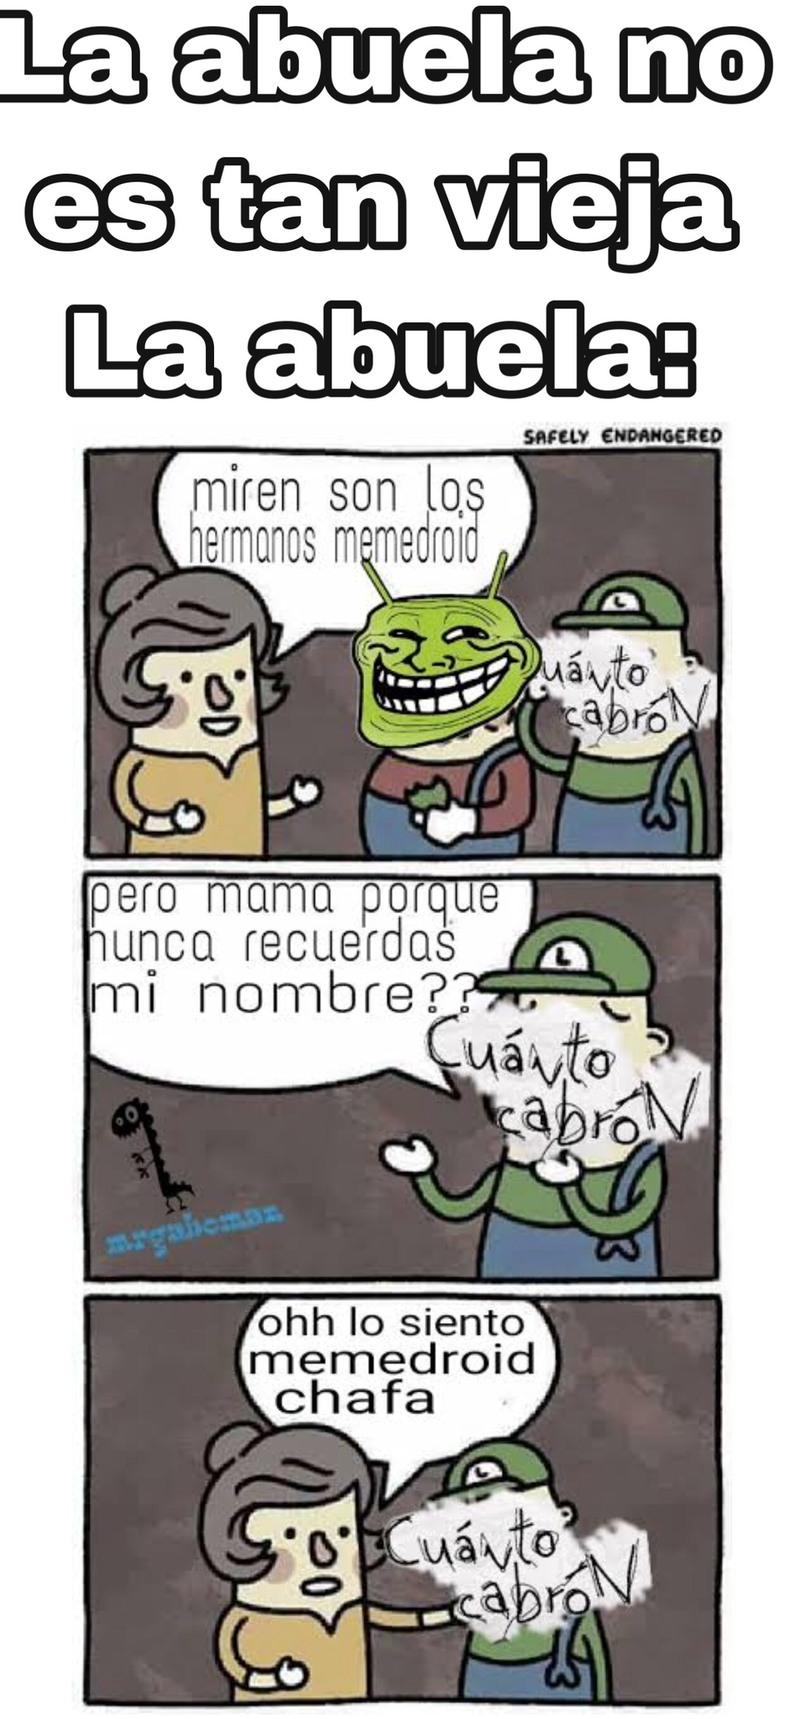 tremendo trolo - meme